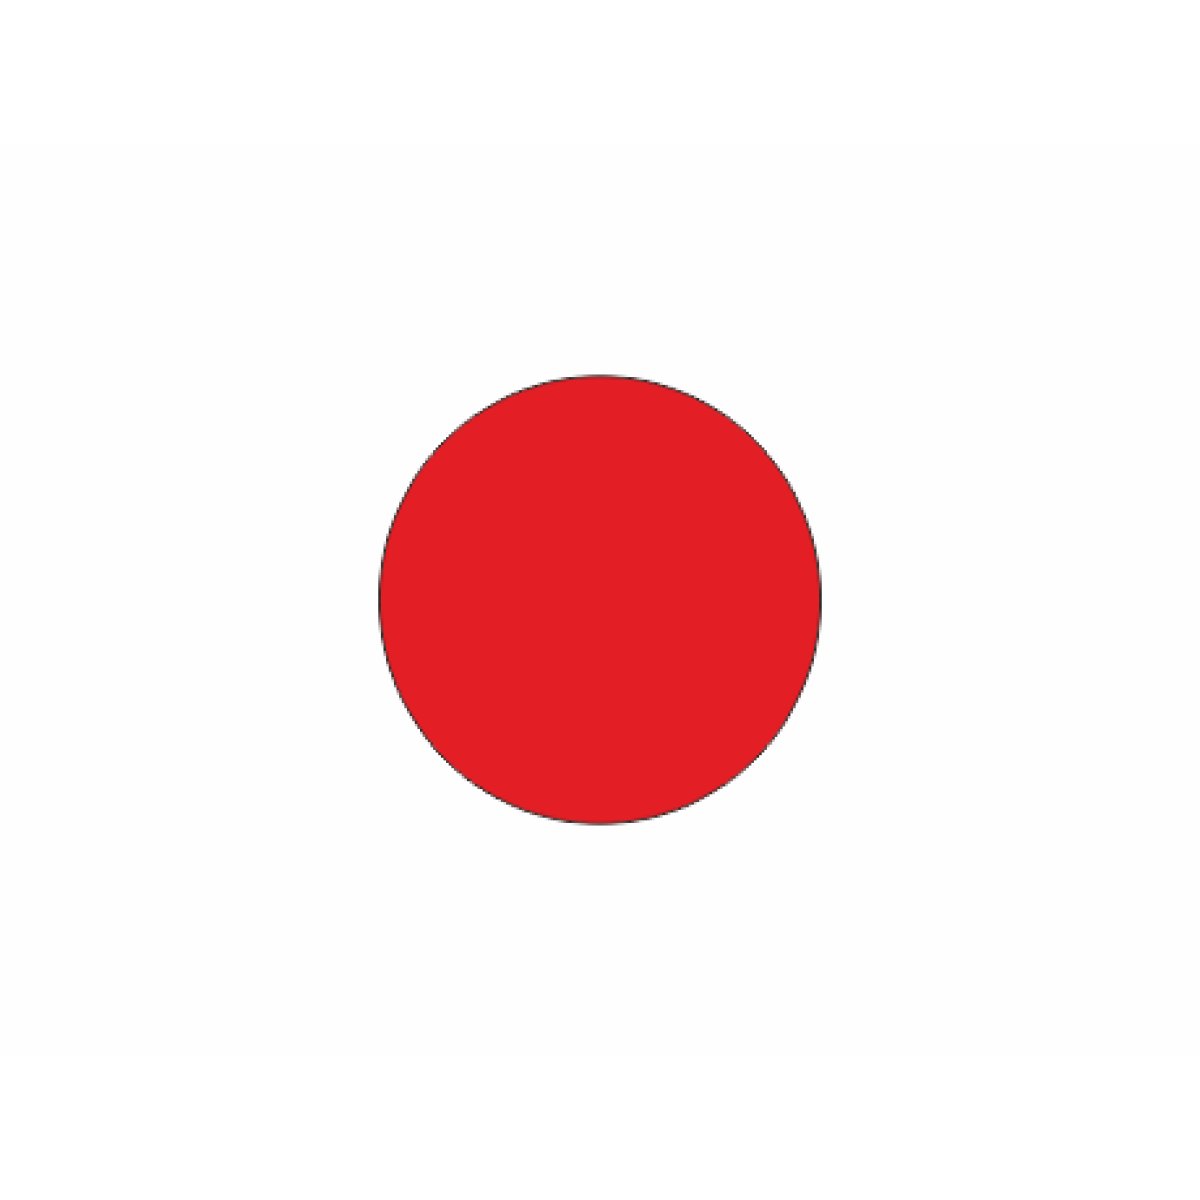 Красный круг метка